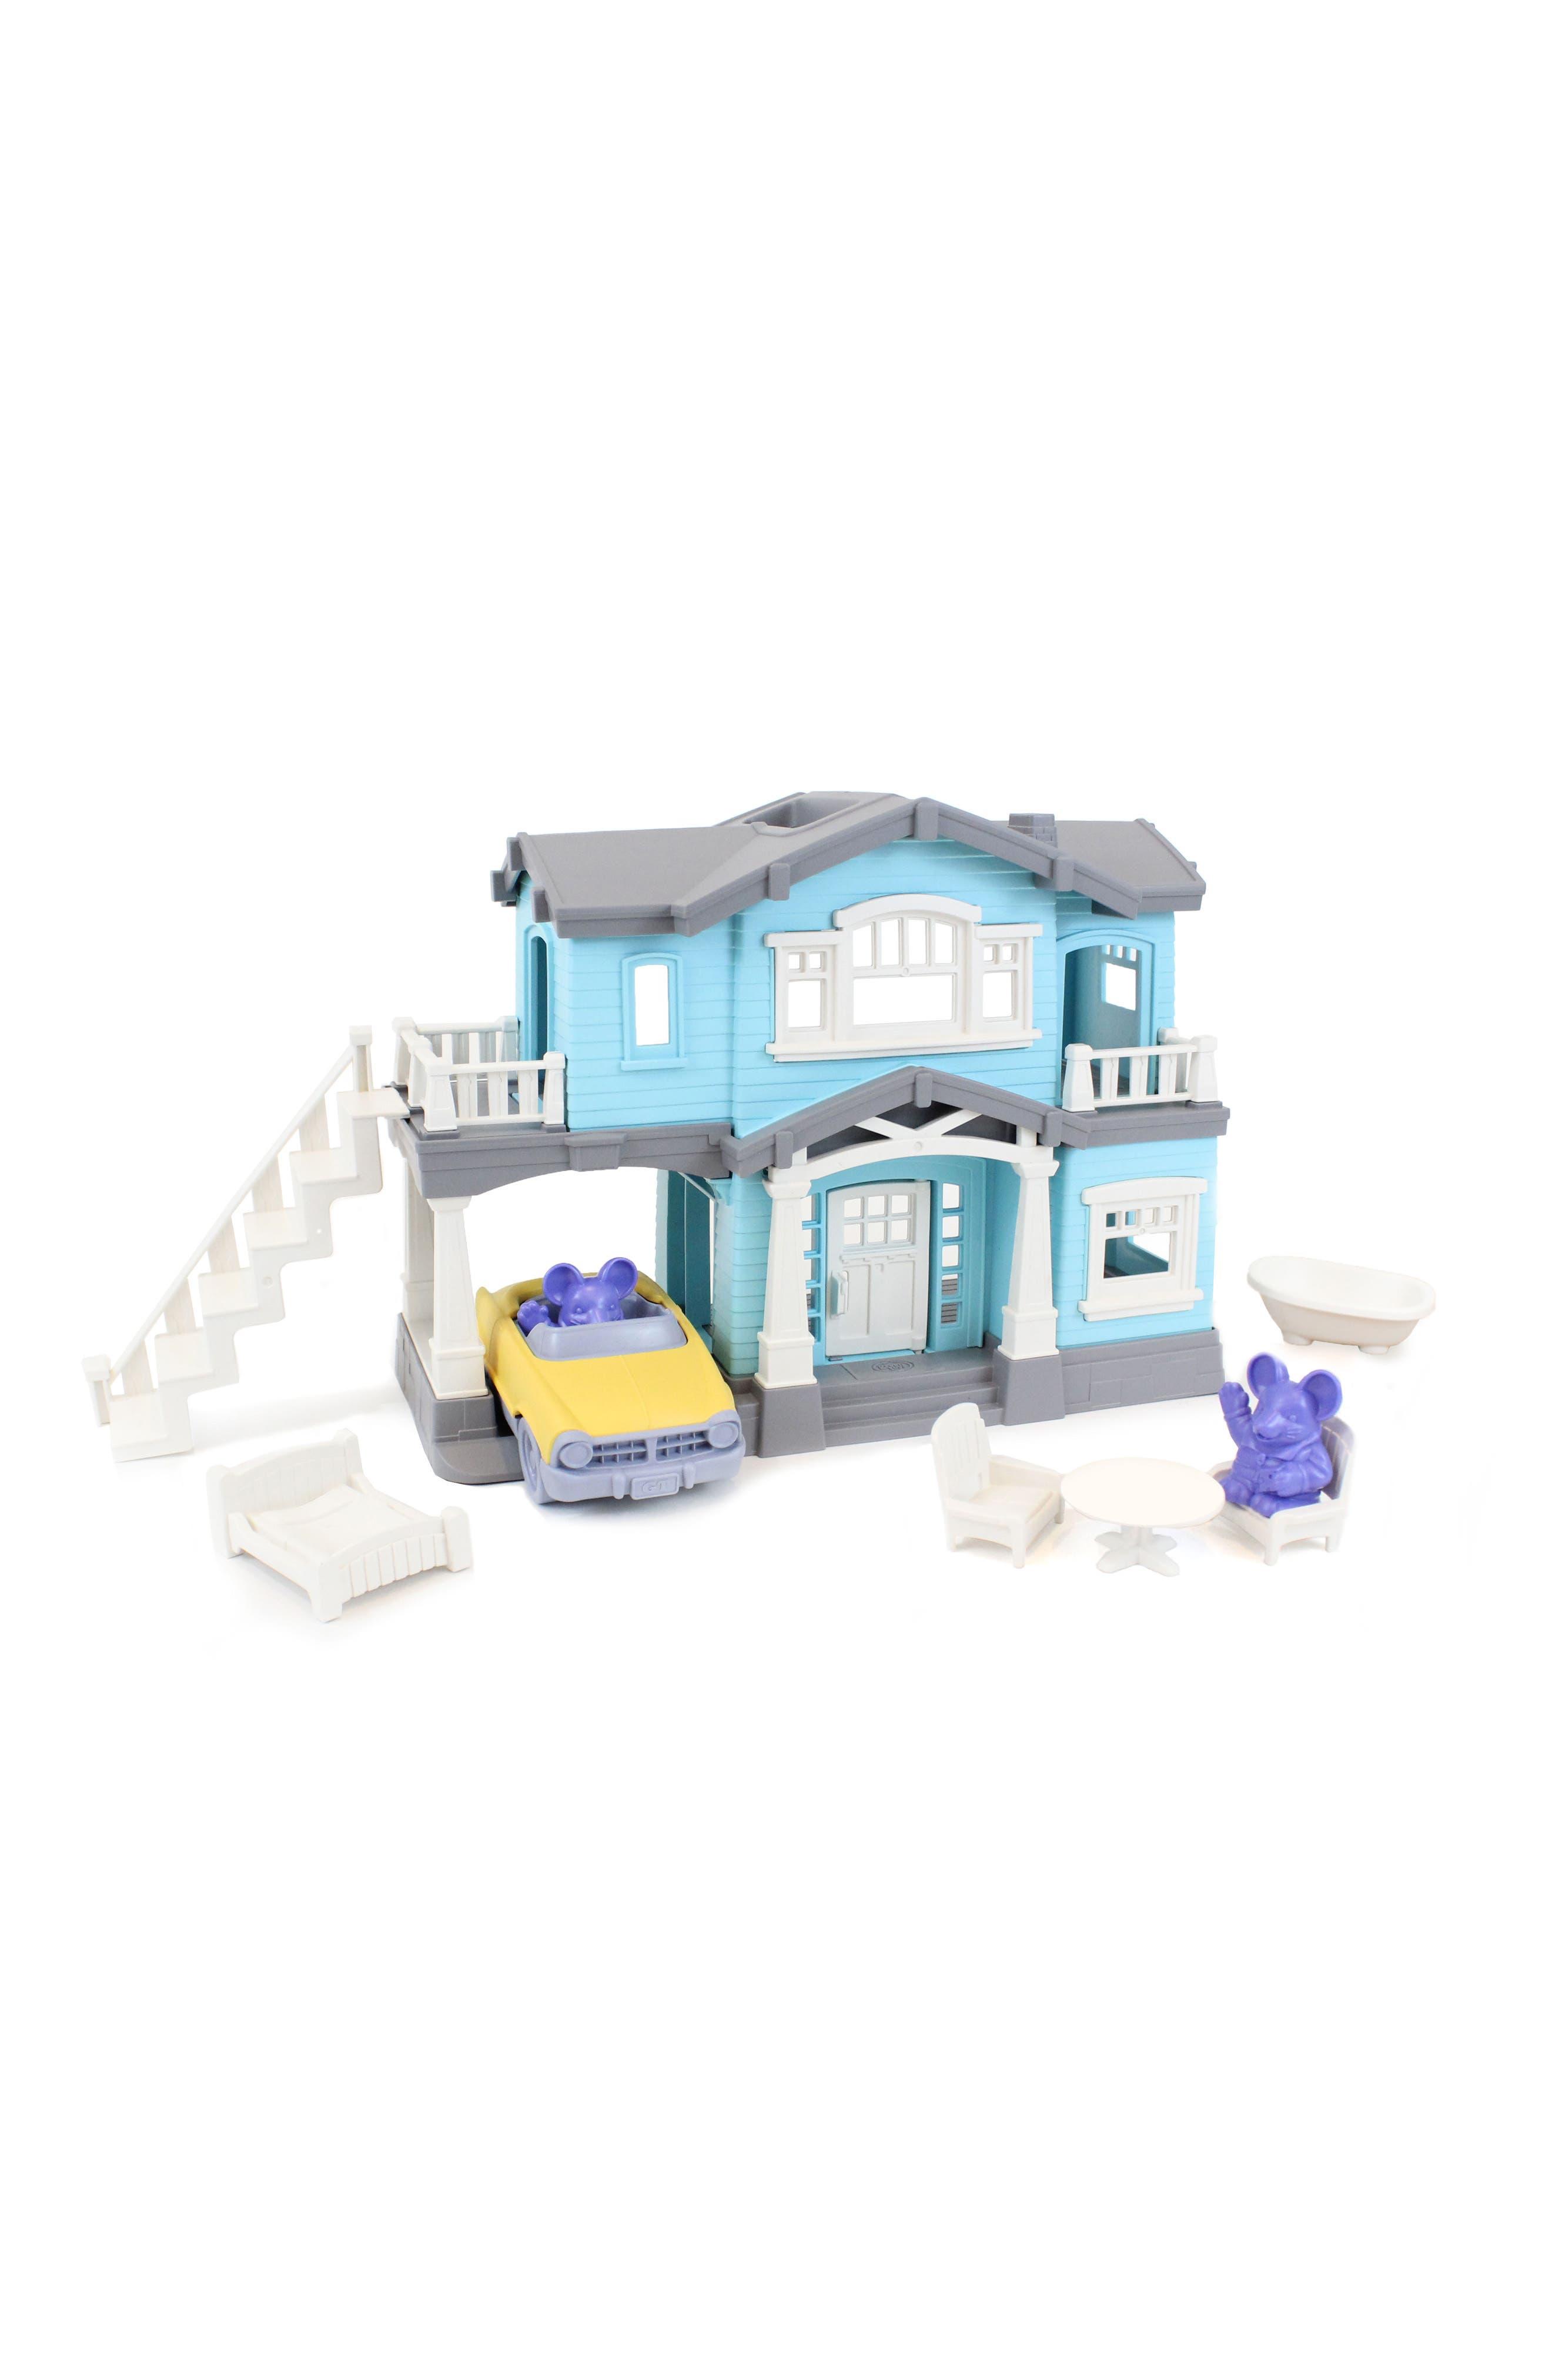 10-Piece House Play Set,                             Alternate thumbnail 4, color,                             450